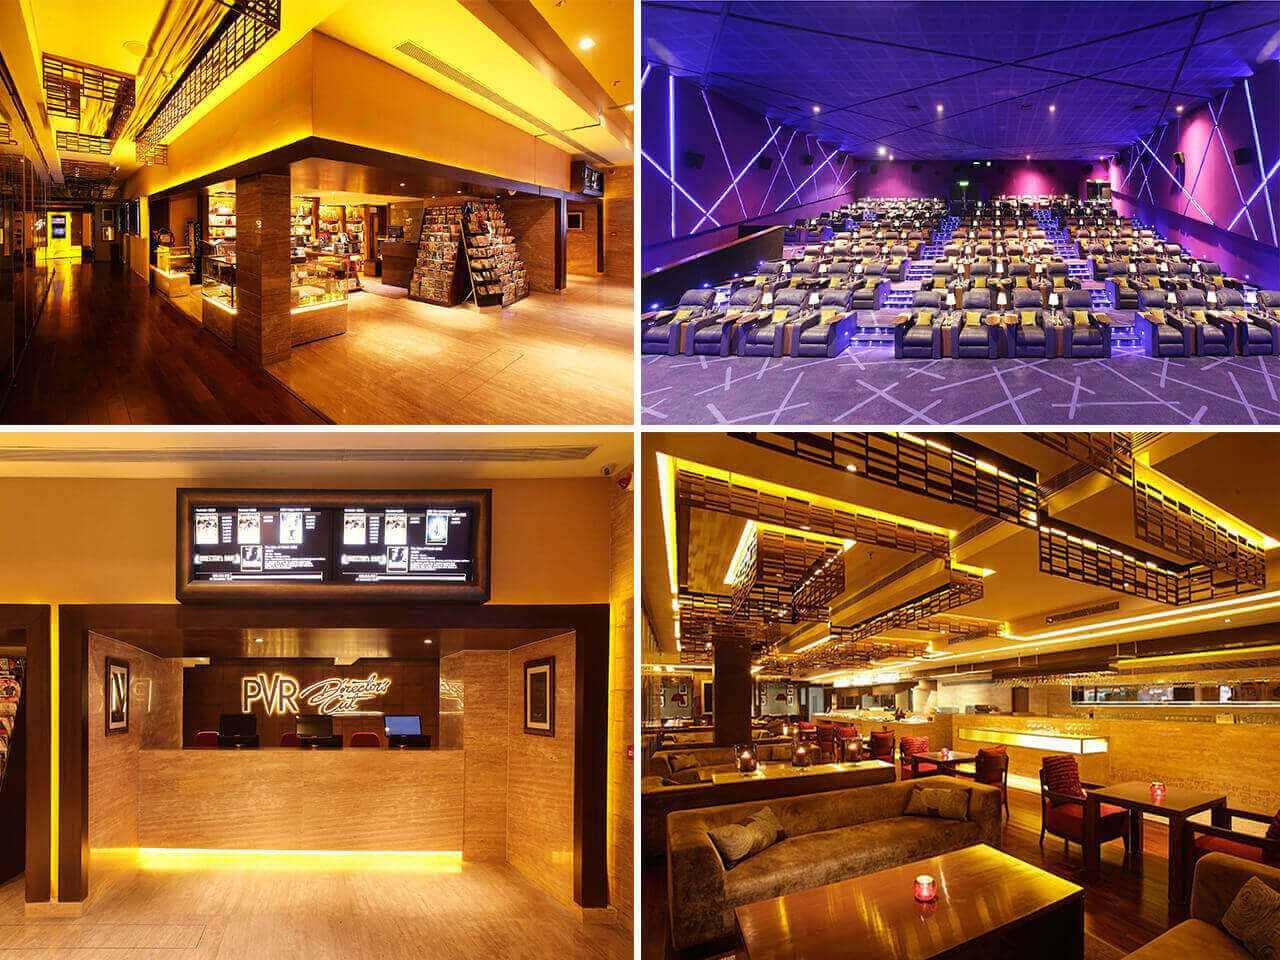 <p>PVR Director's Cut (Gold Class Lounge)</p>